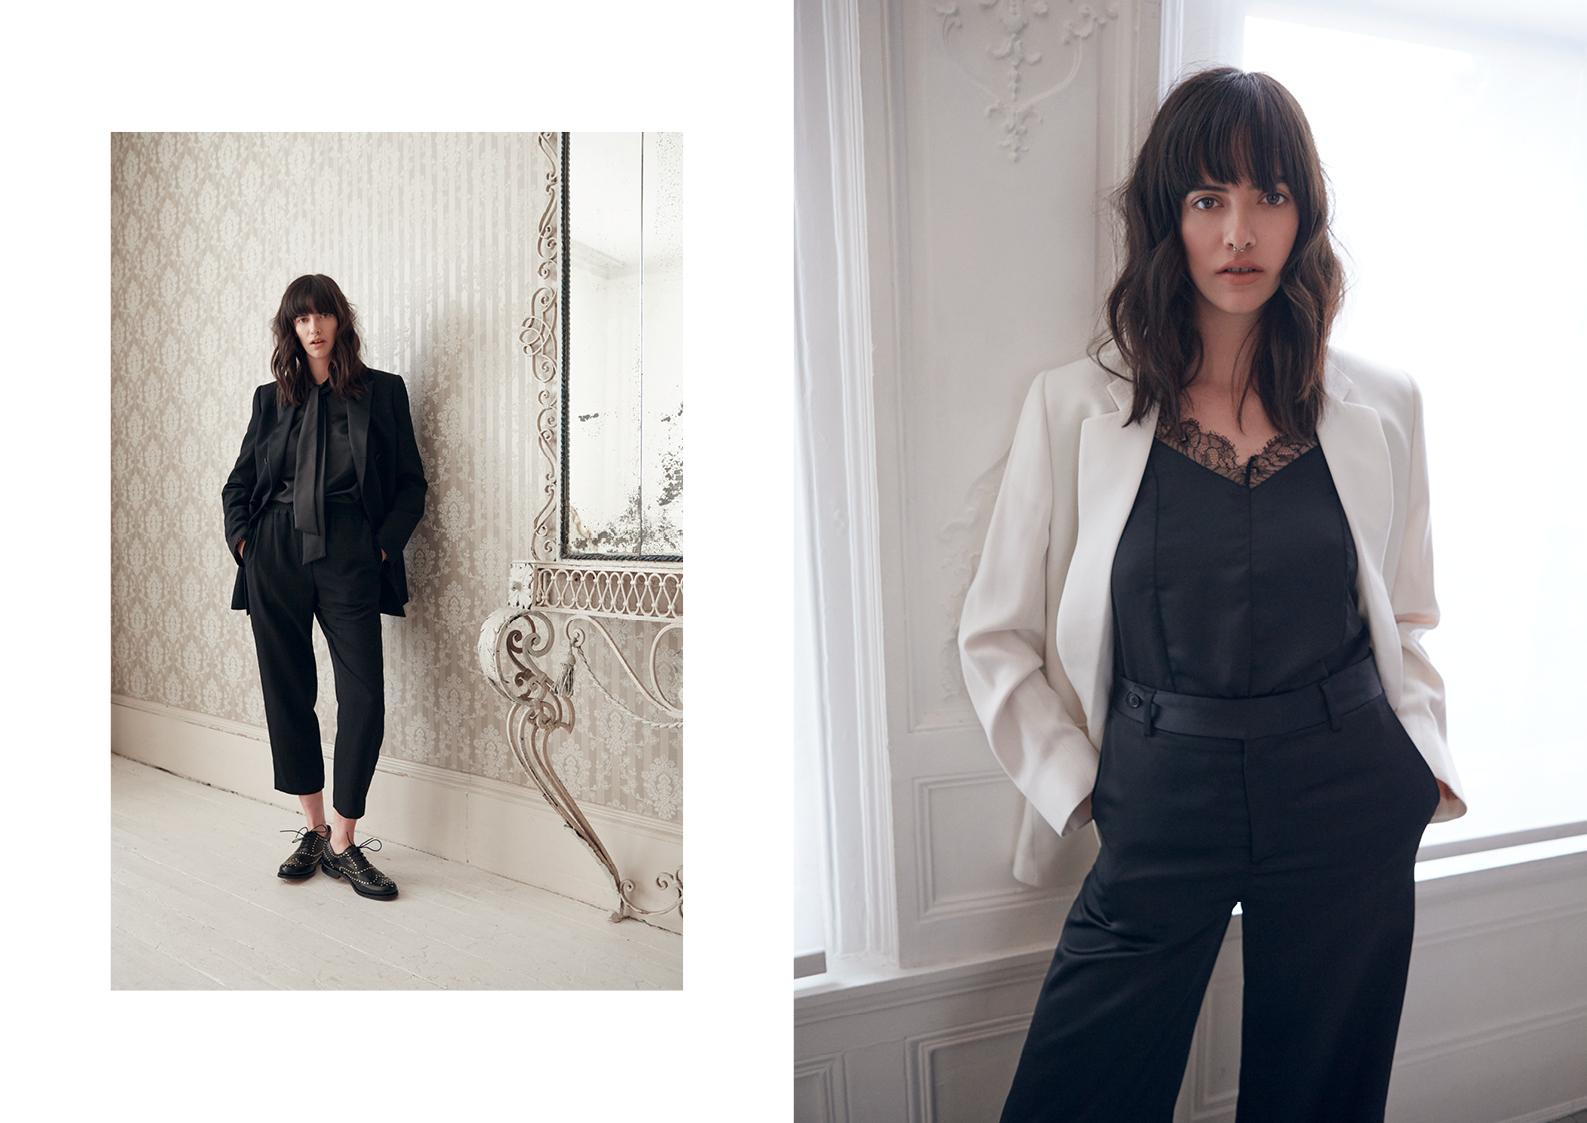 Fashion Editorial Photography for Make Magazine UK of model Mitch I Greg Sorensen I Fashion & Beauty Photographer I NYC